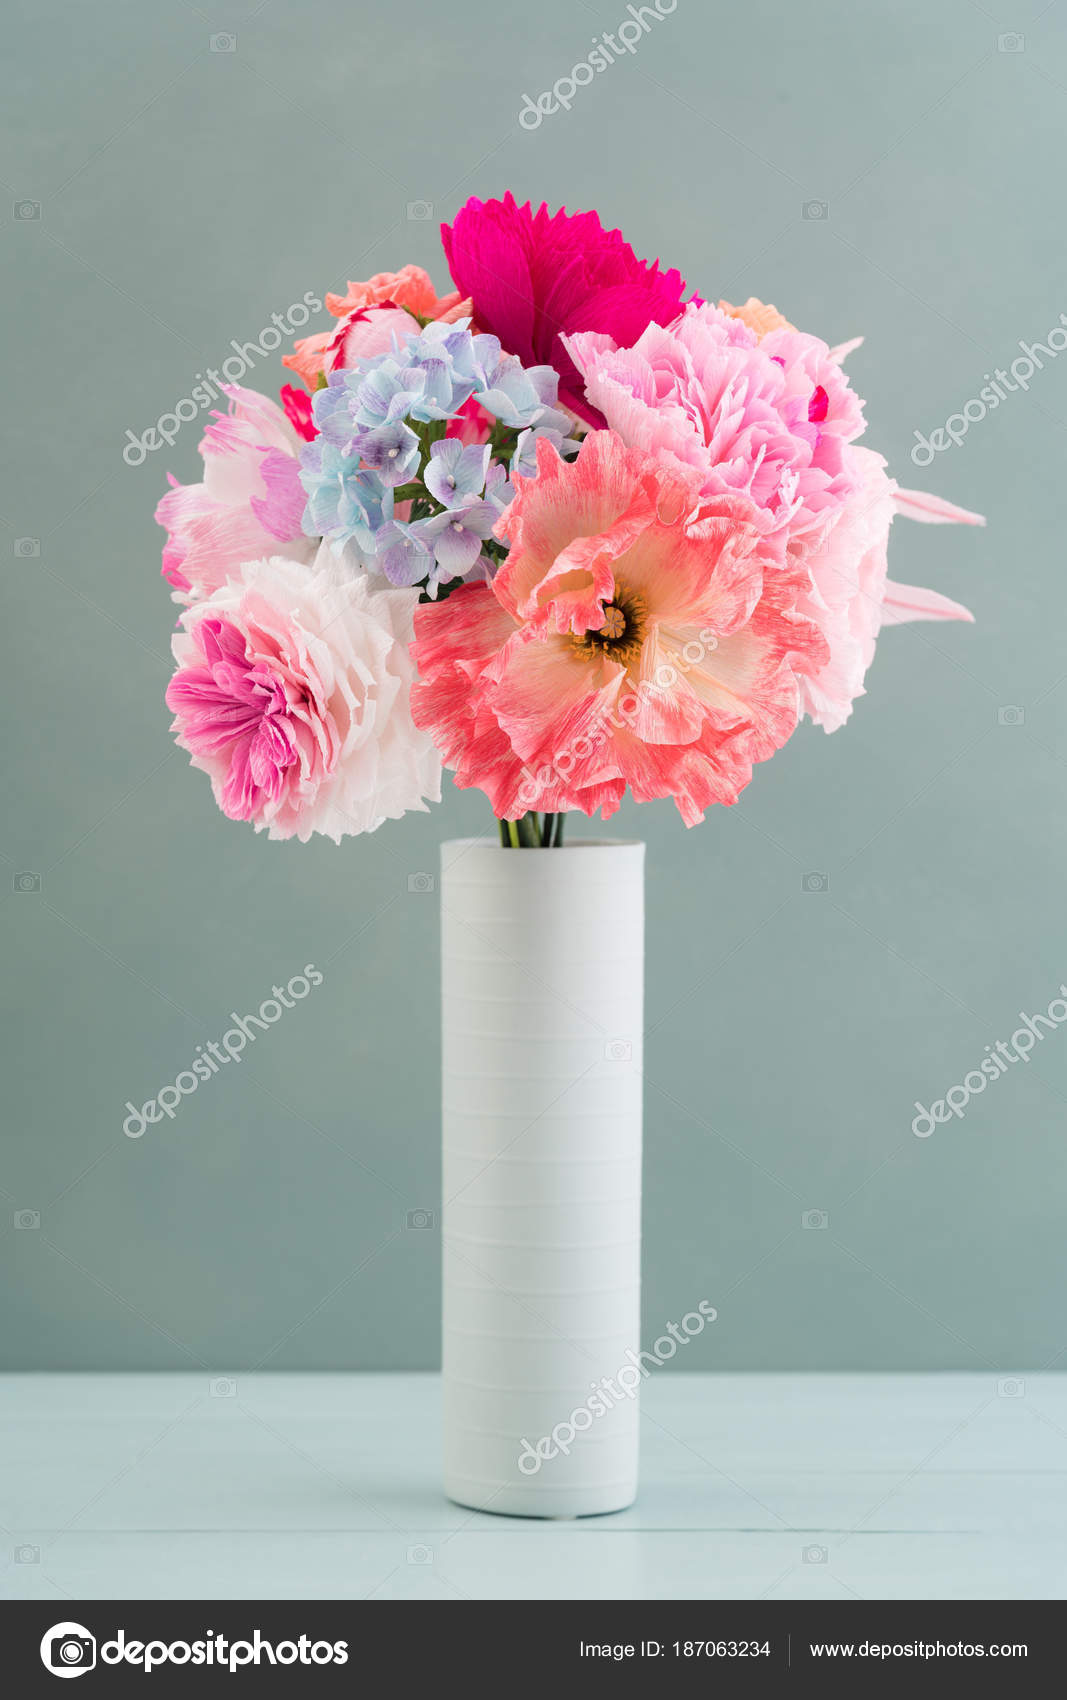 Crepe Paper Flower Bouquet Stock Photo Ecoelfen 187063234